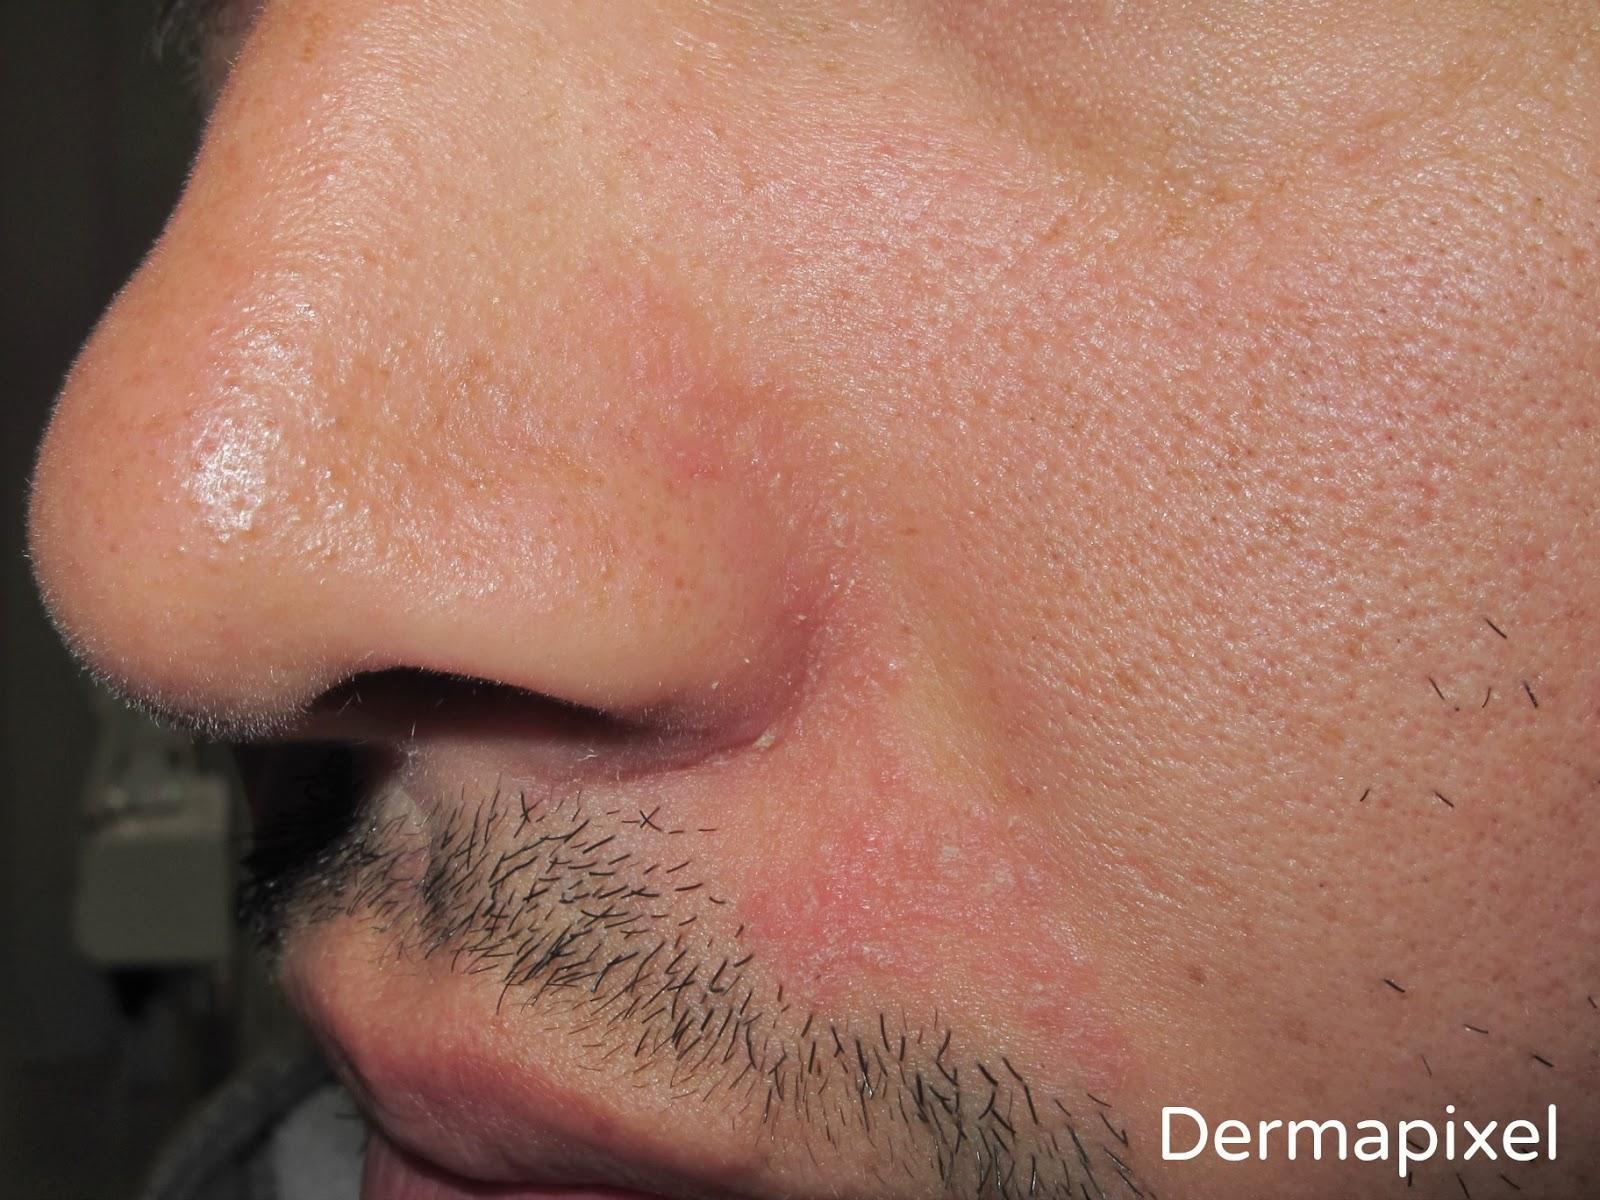 corticosteroides nasales efectos secundarios